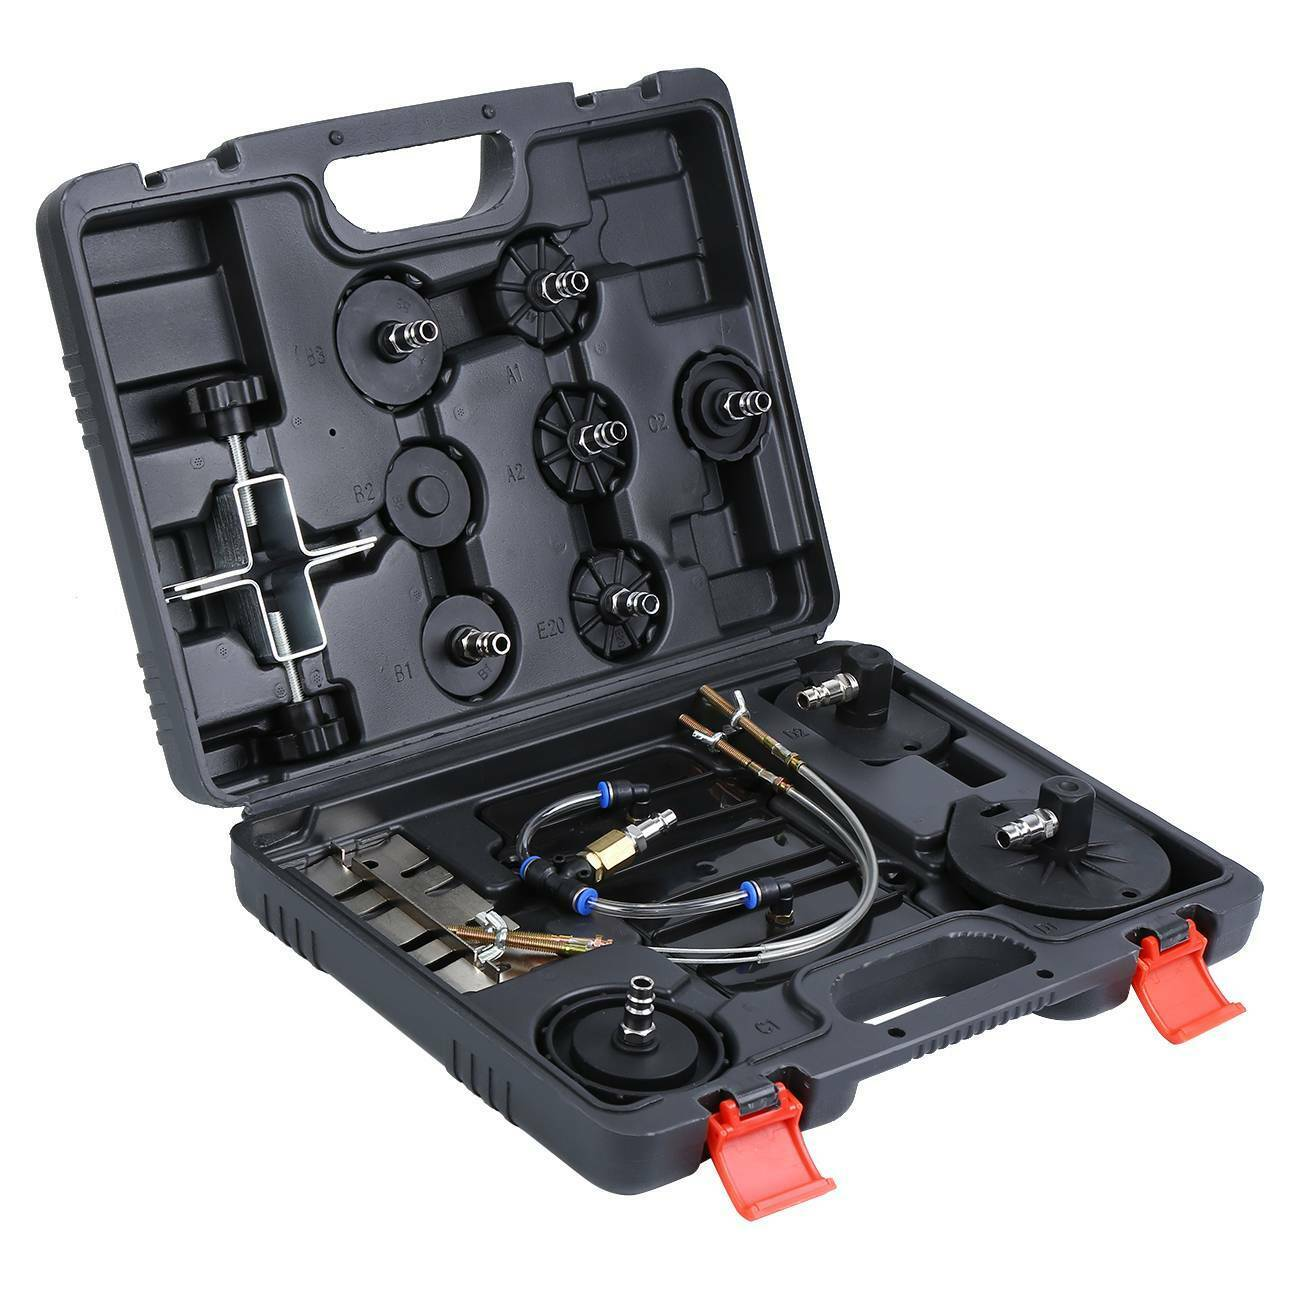 Samger  Air Pressure Brake Bleeder Adapters E20 Compressed Air Bleeder Pneumatic Brake Bleed Set Box